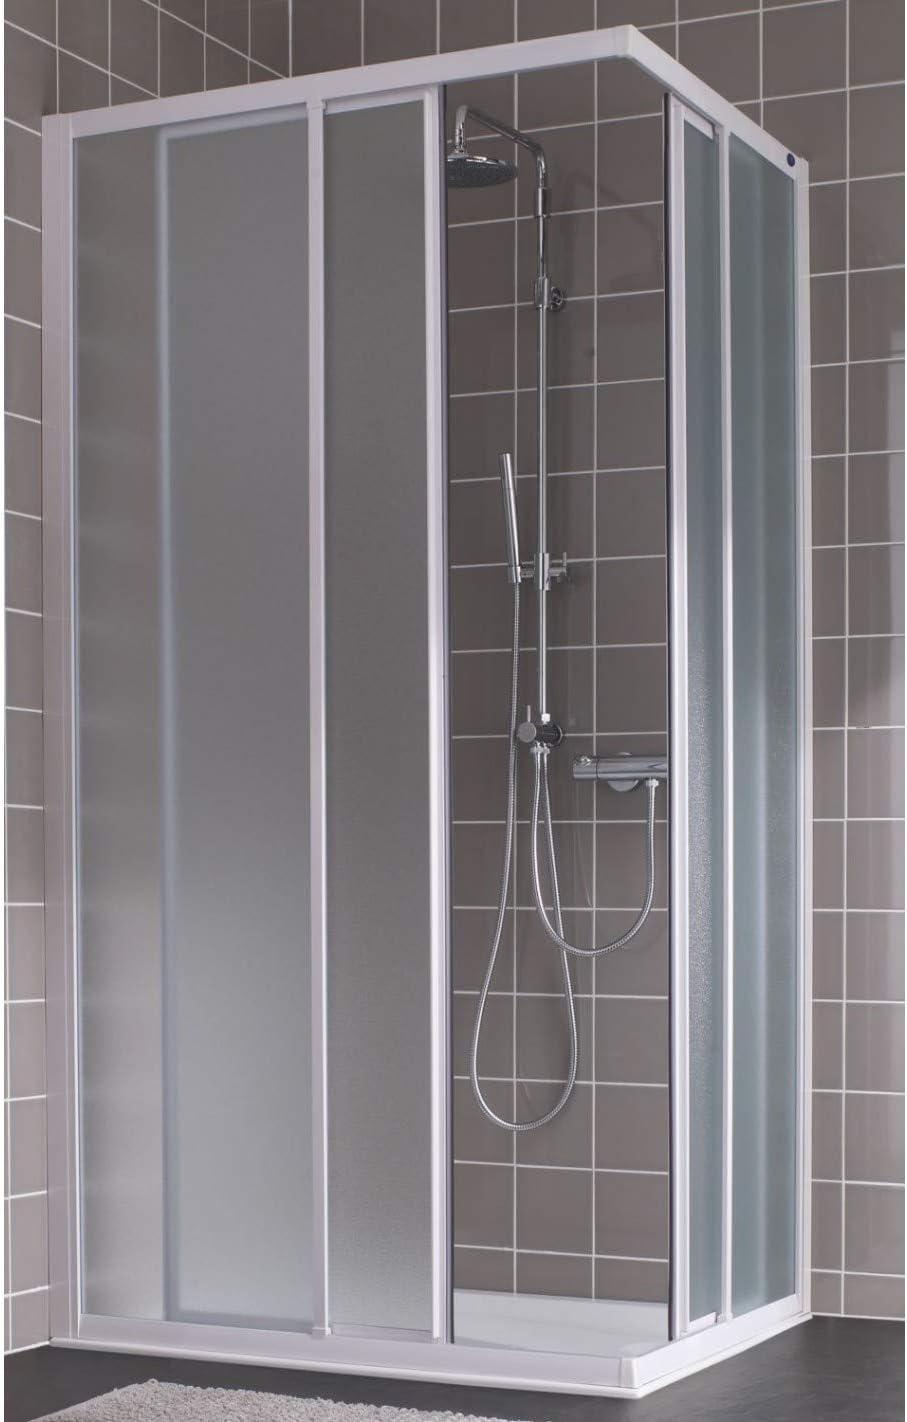 Mampara de ducha D?Ángulo deslizante vidrio apariencia Atout 2 ...